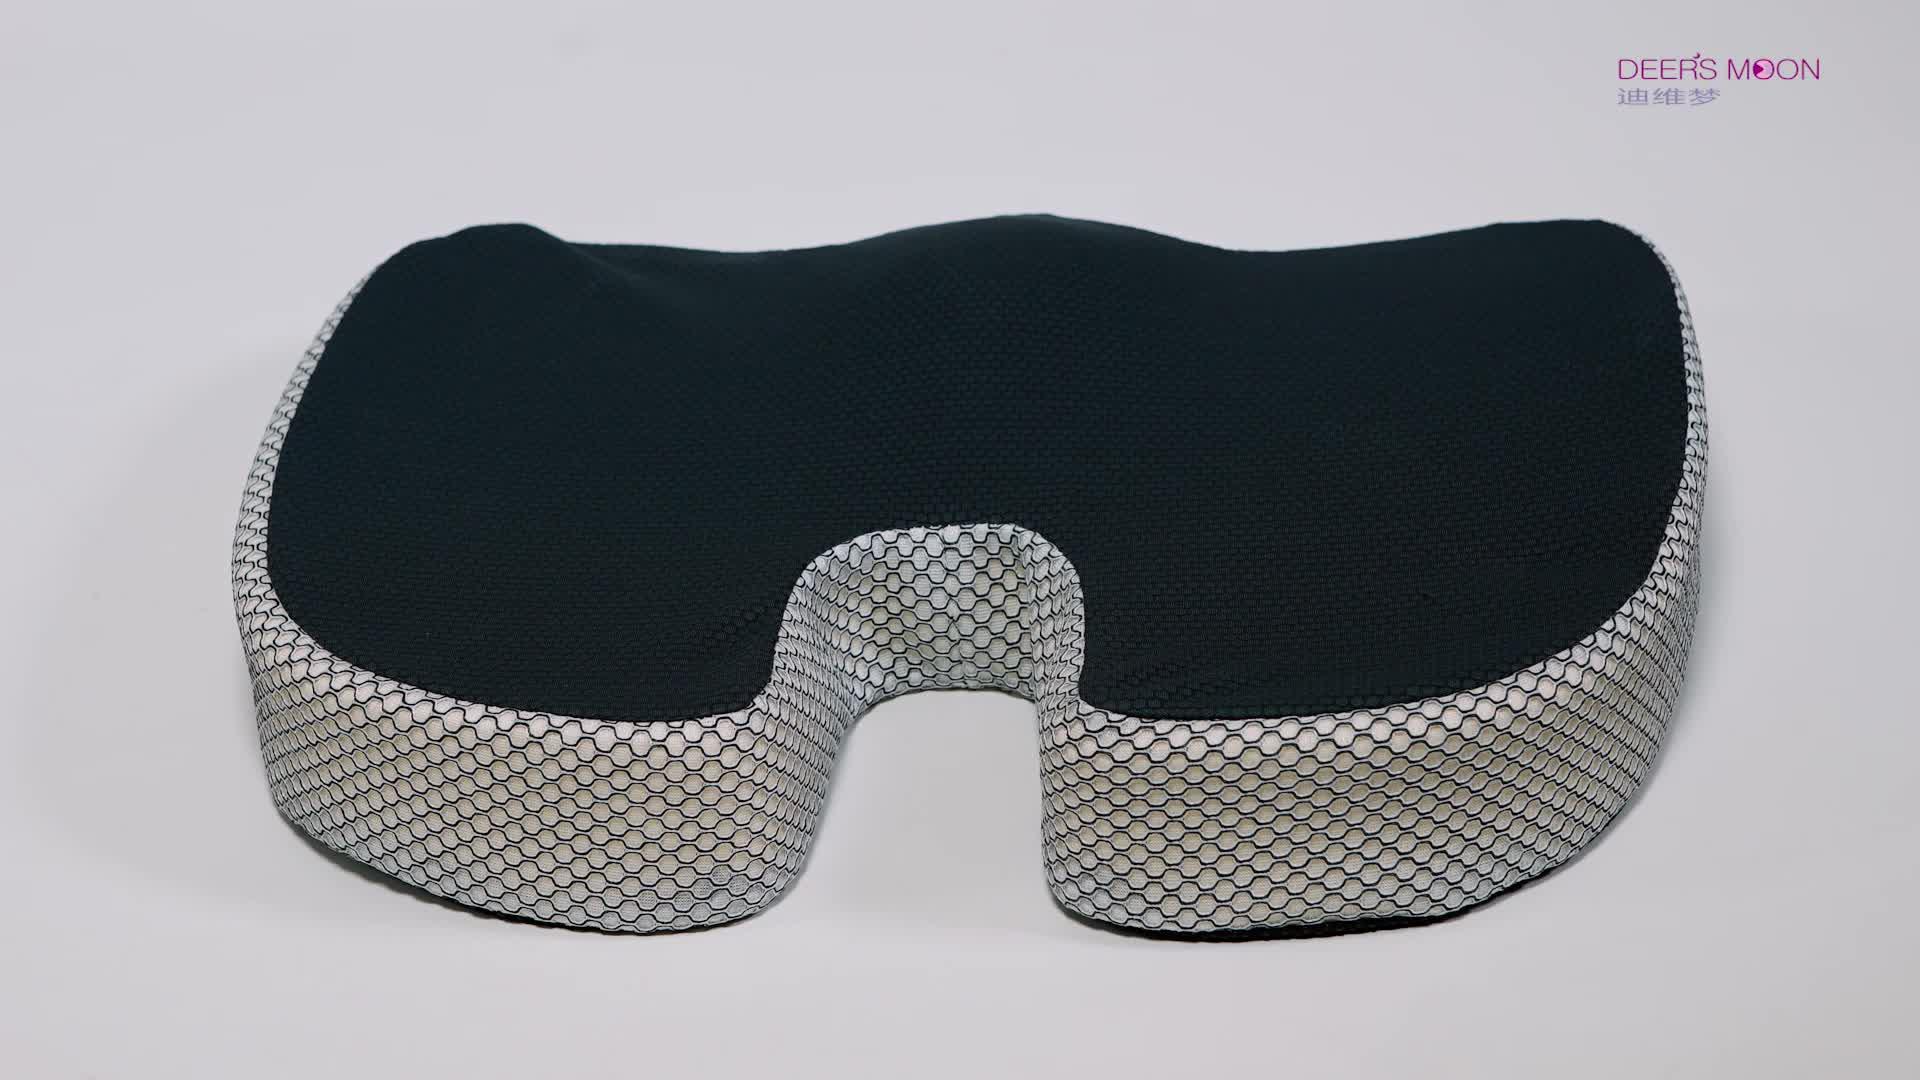 best office chair for hemorrhoids circular bamboo cushion zero gravity relief pressure hemorrhoid memory foam seat